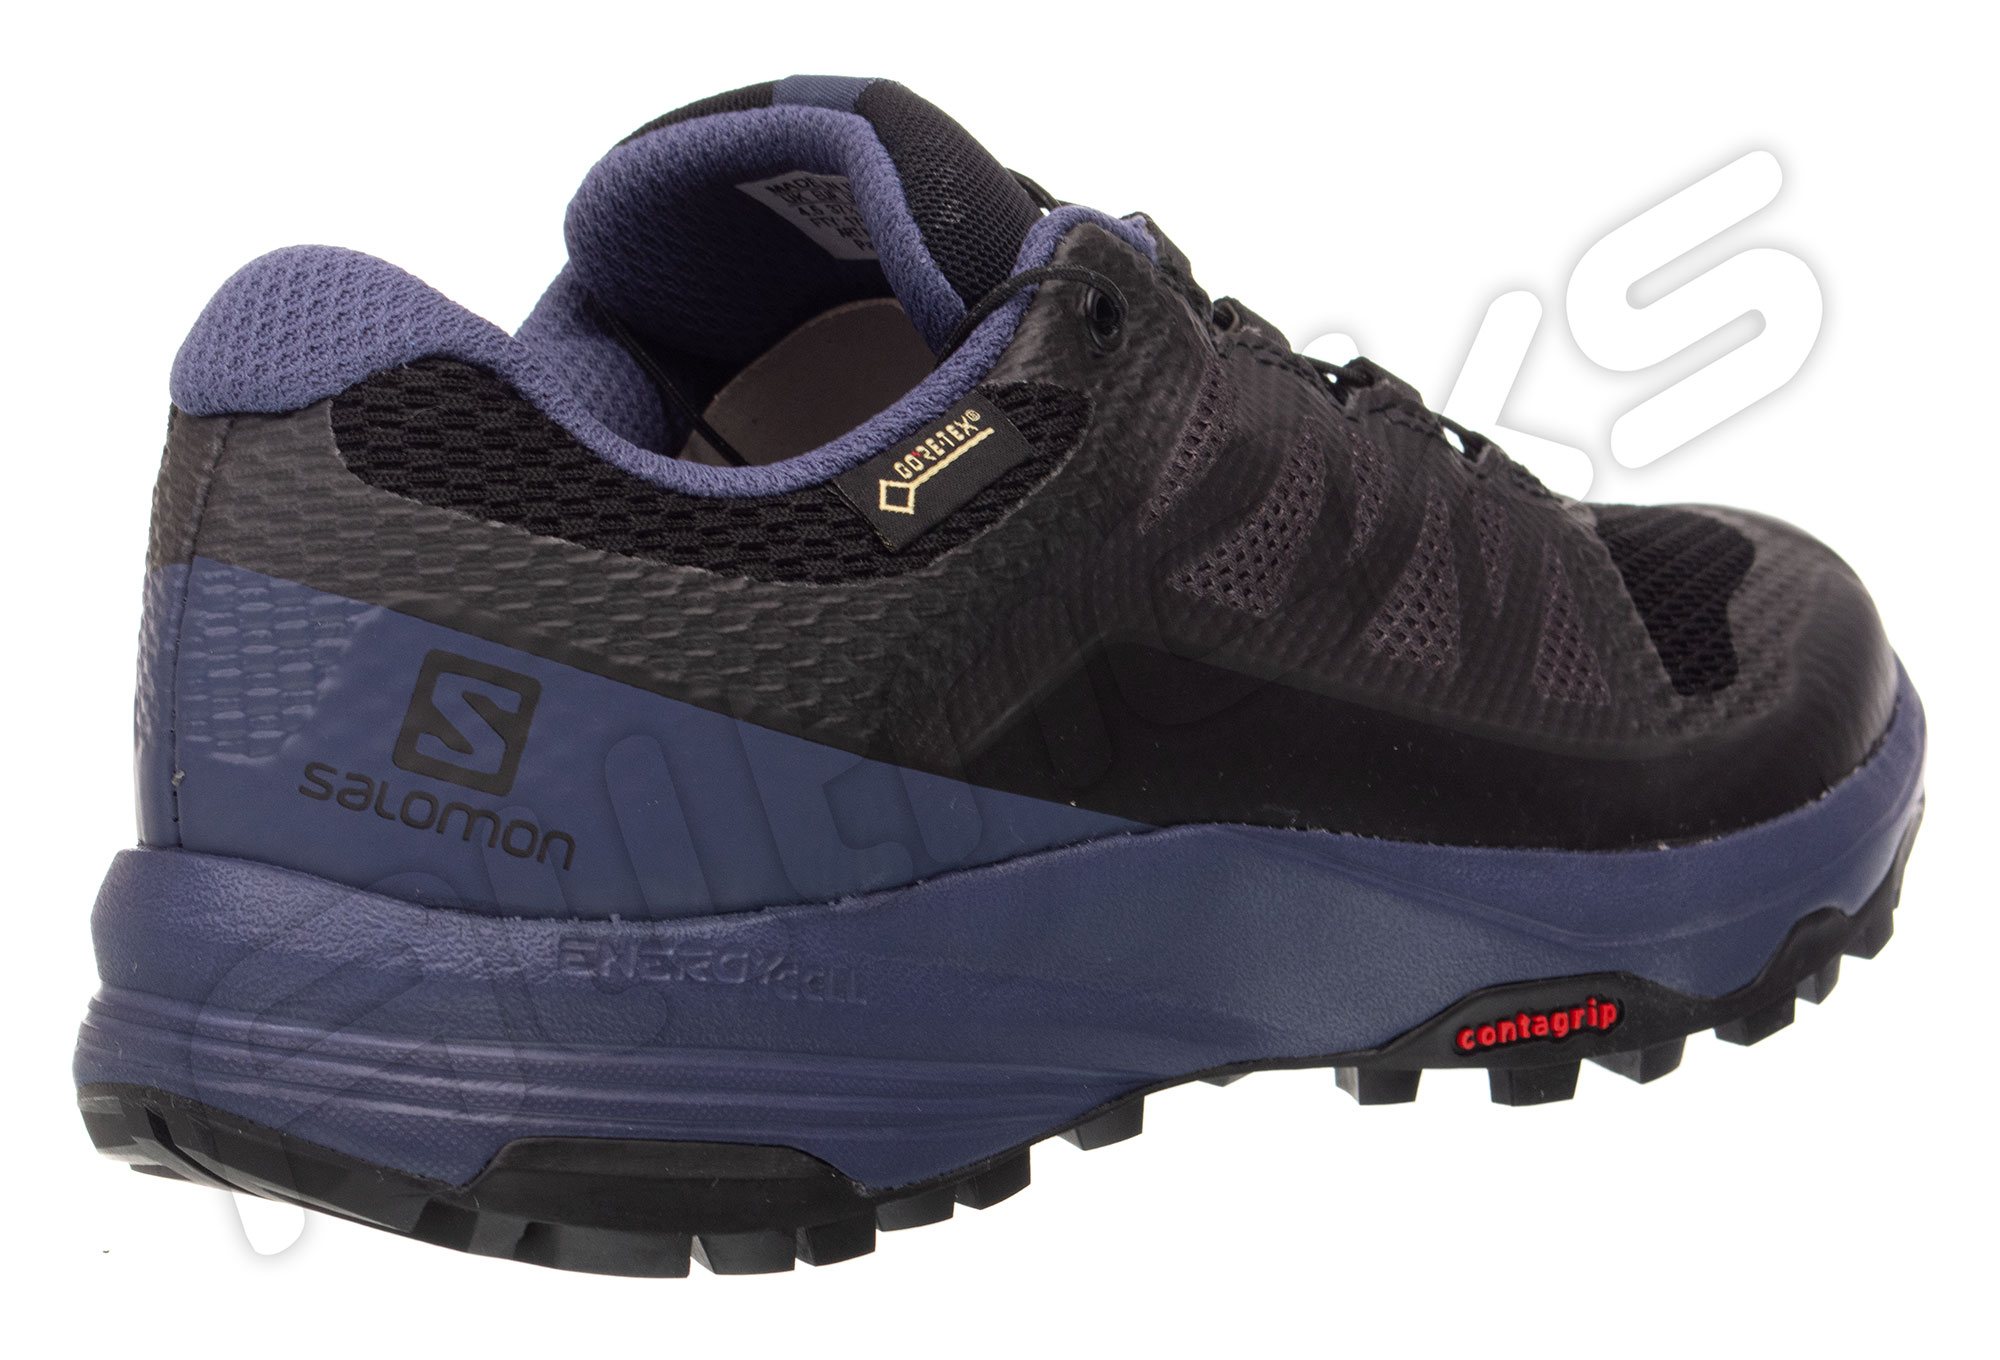 Salomon XA Discovery Womens Shoes